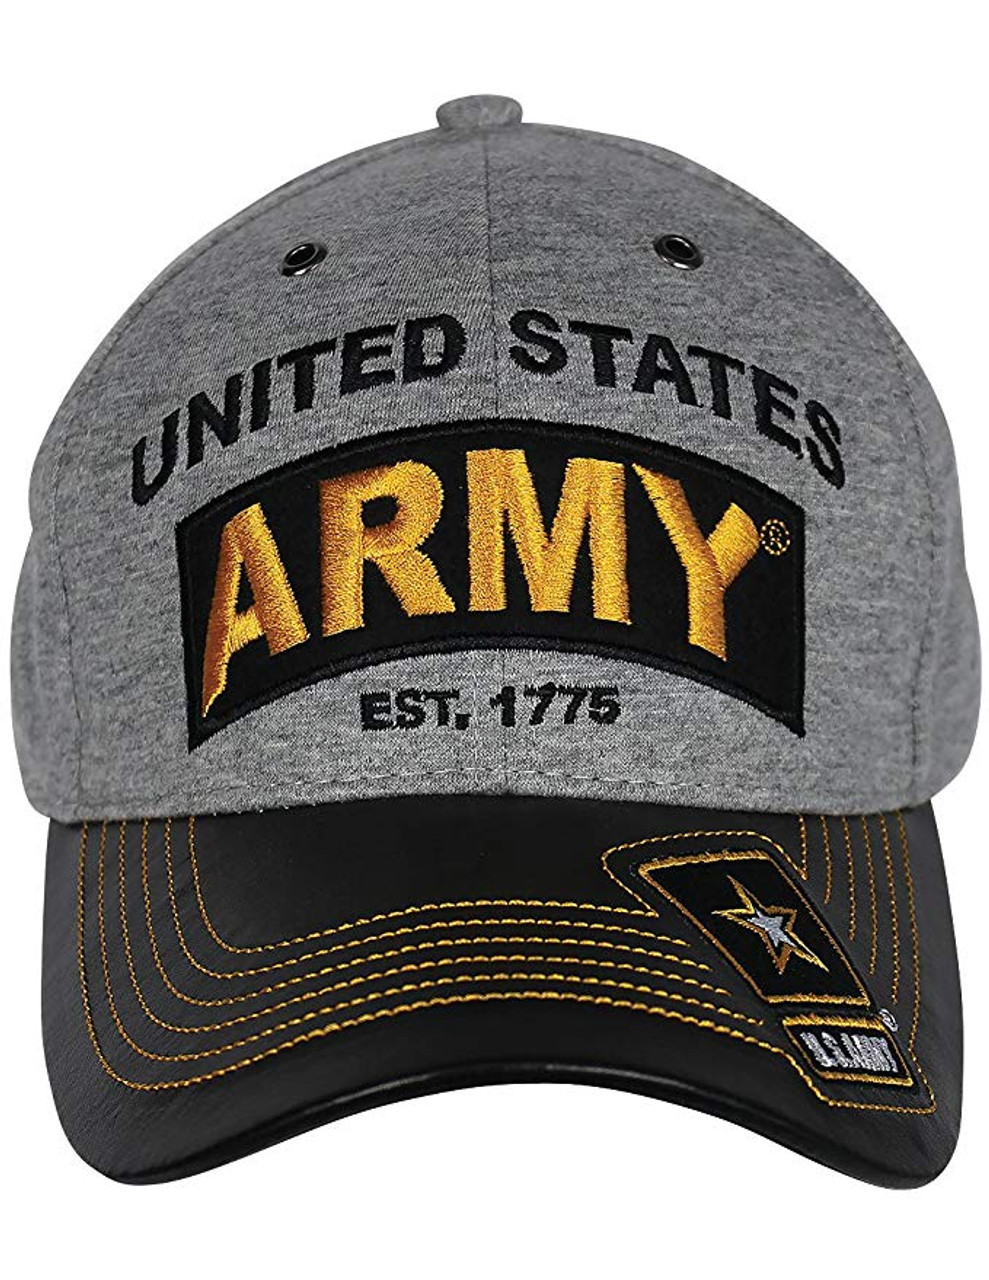 13aec3afe7144e U.S. Army Cap - Jersey Knit Cotton/Faux Leather Bill - Grey/Black -  USMILITARYHATS.COM